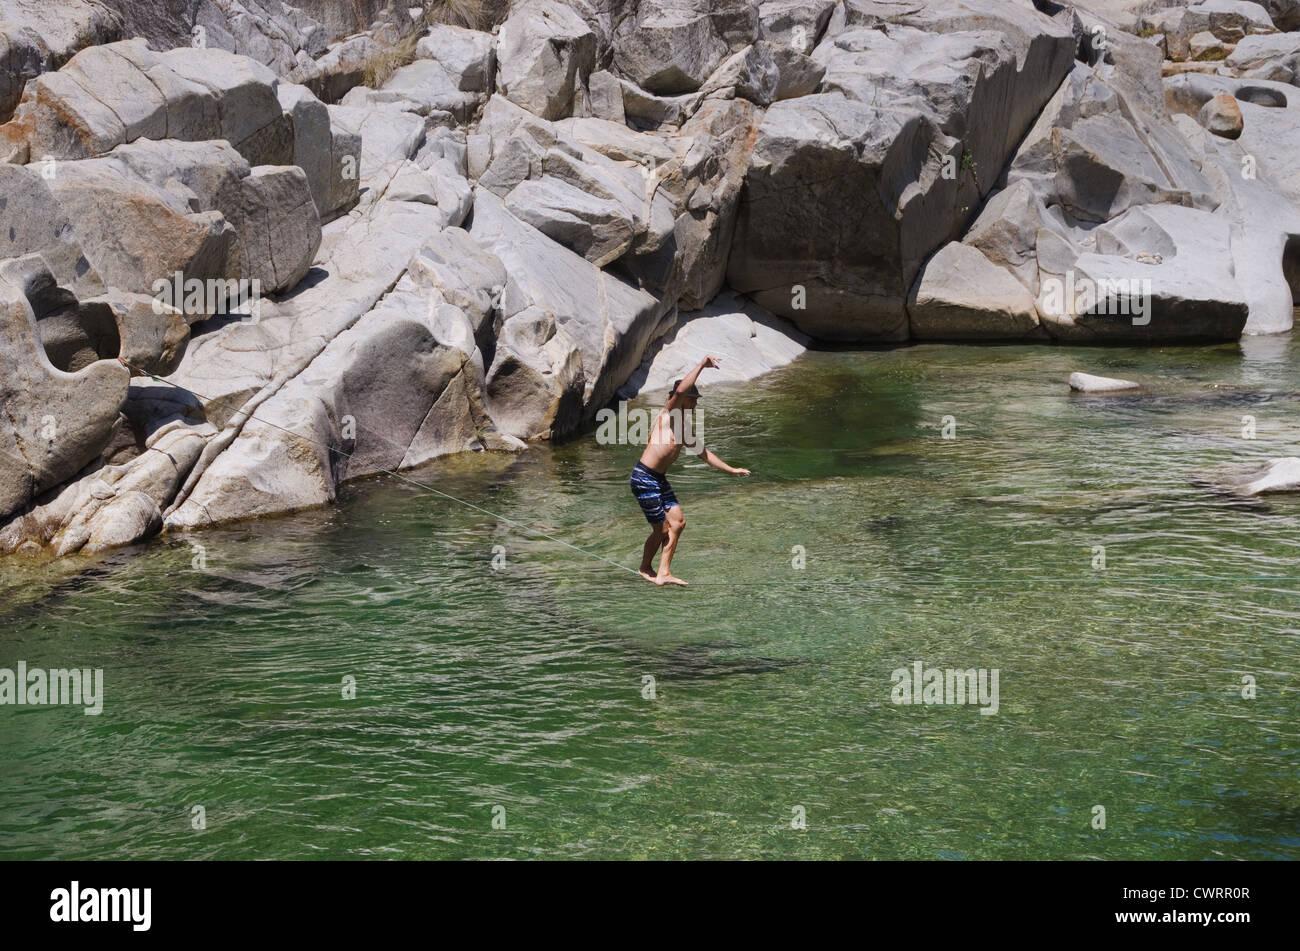 a man slacklining over the Yuba River - Stock Image